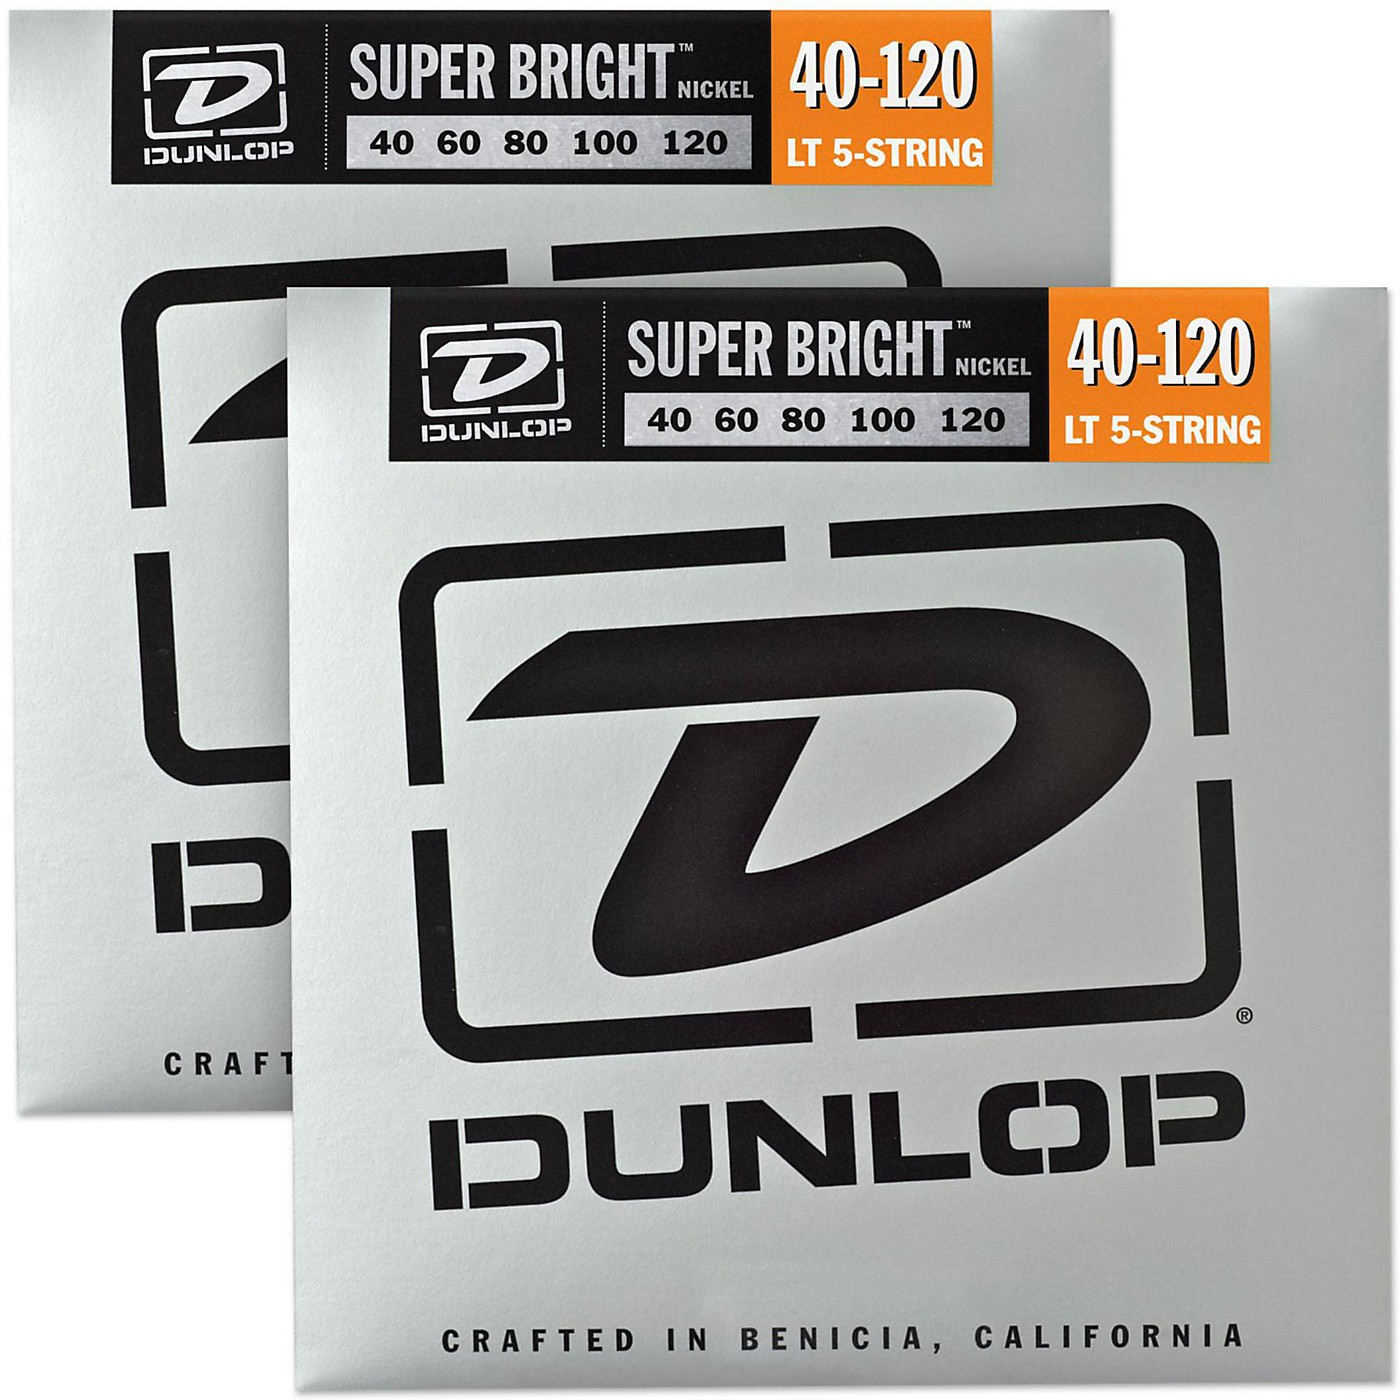 Dunlop Super Bright Nickel Light 5-String Bass Guitar Strings (4-120) 2-Pack thumbnail